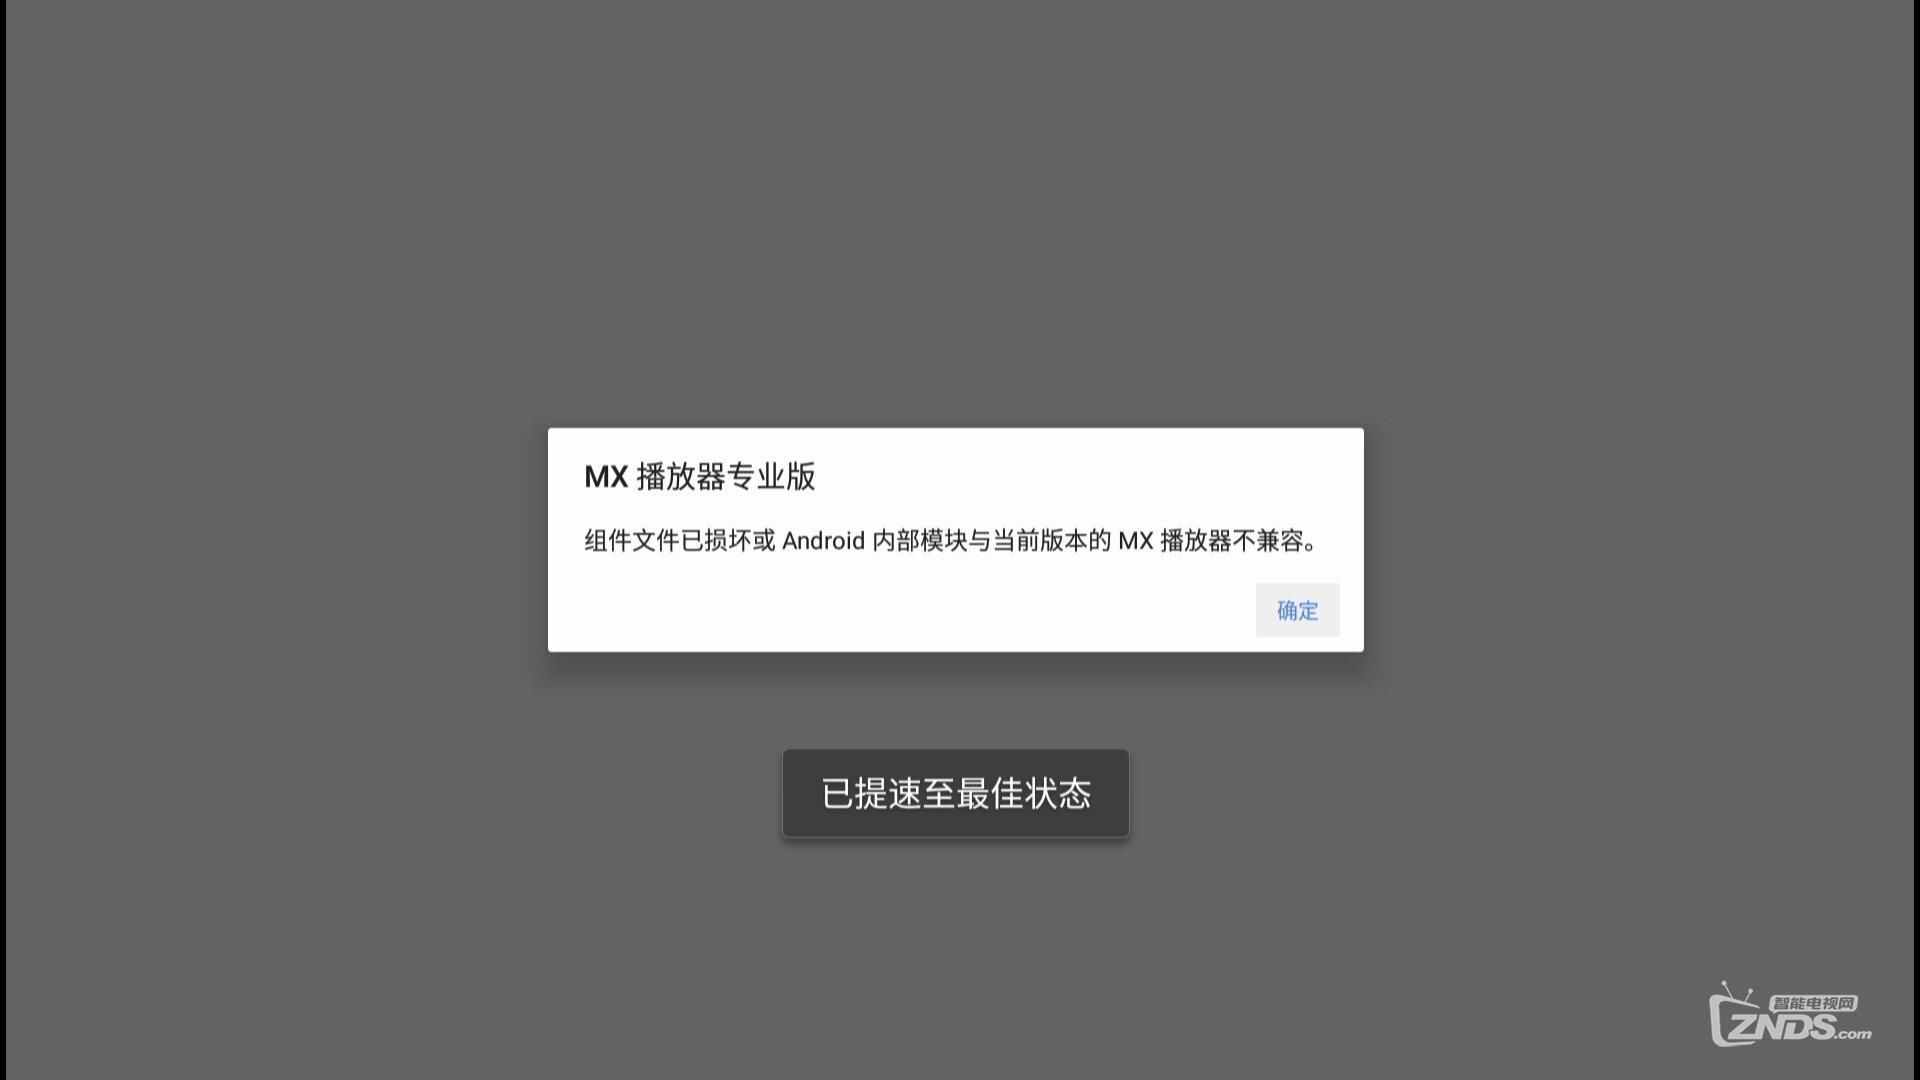 TV_CAM_设备_20180213_111645.745.jpg